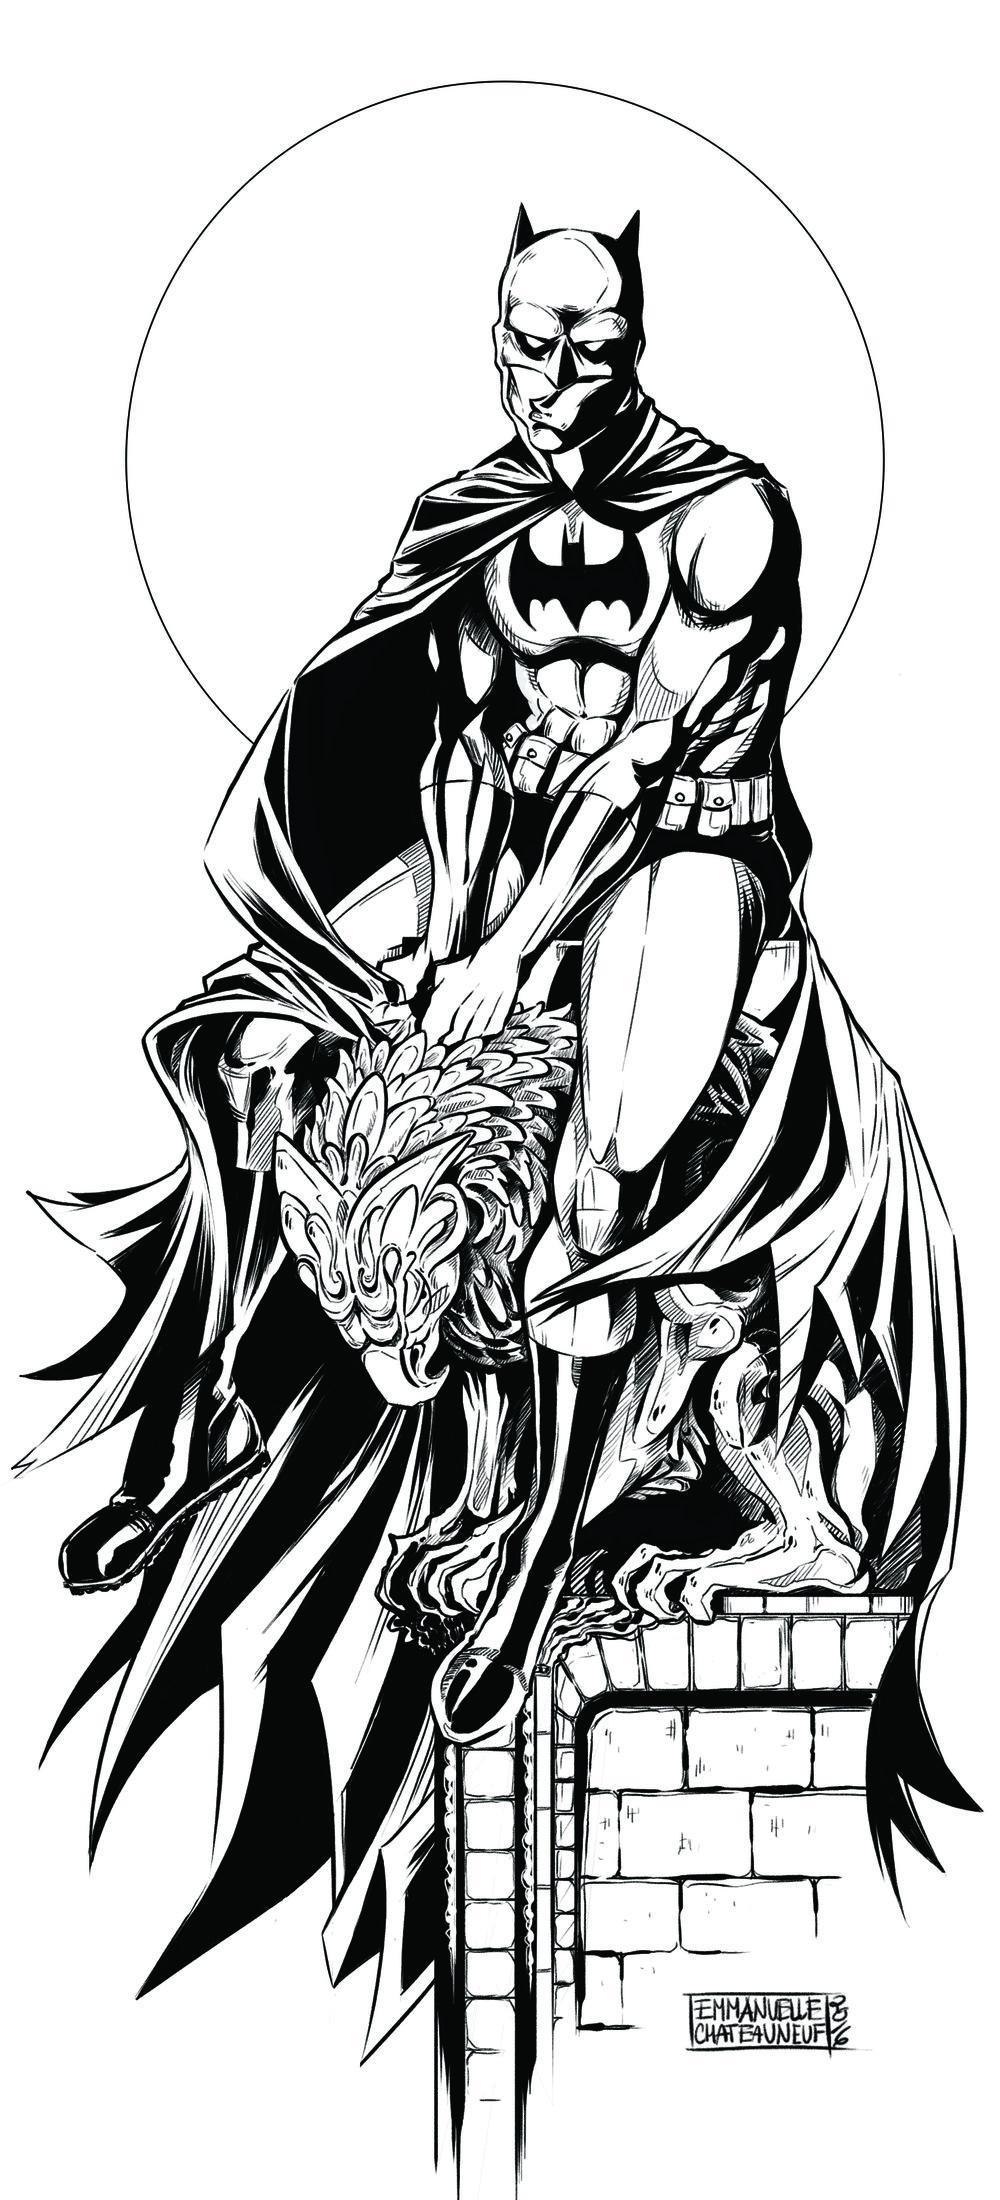 Sassman_Batman.jpg